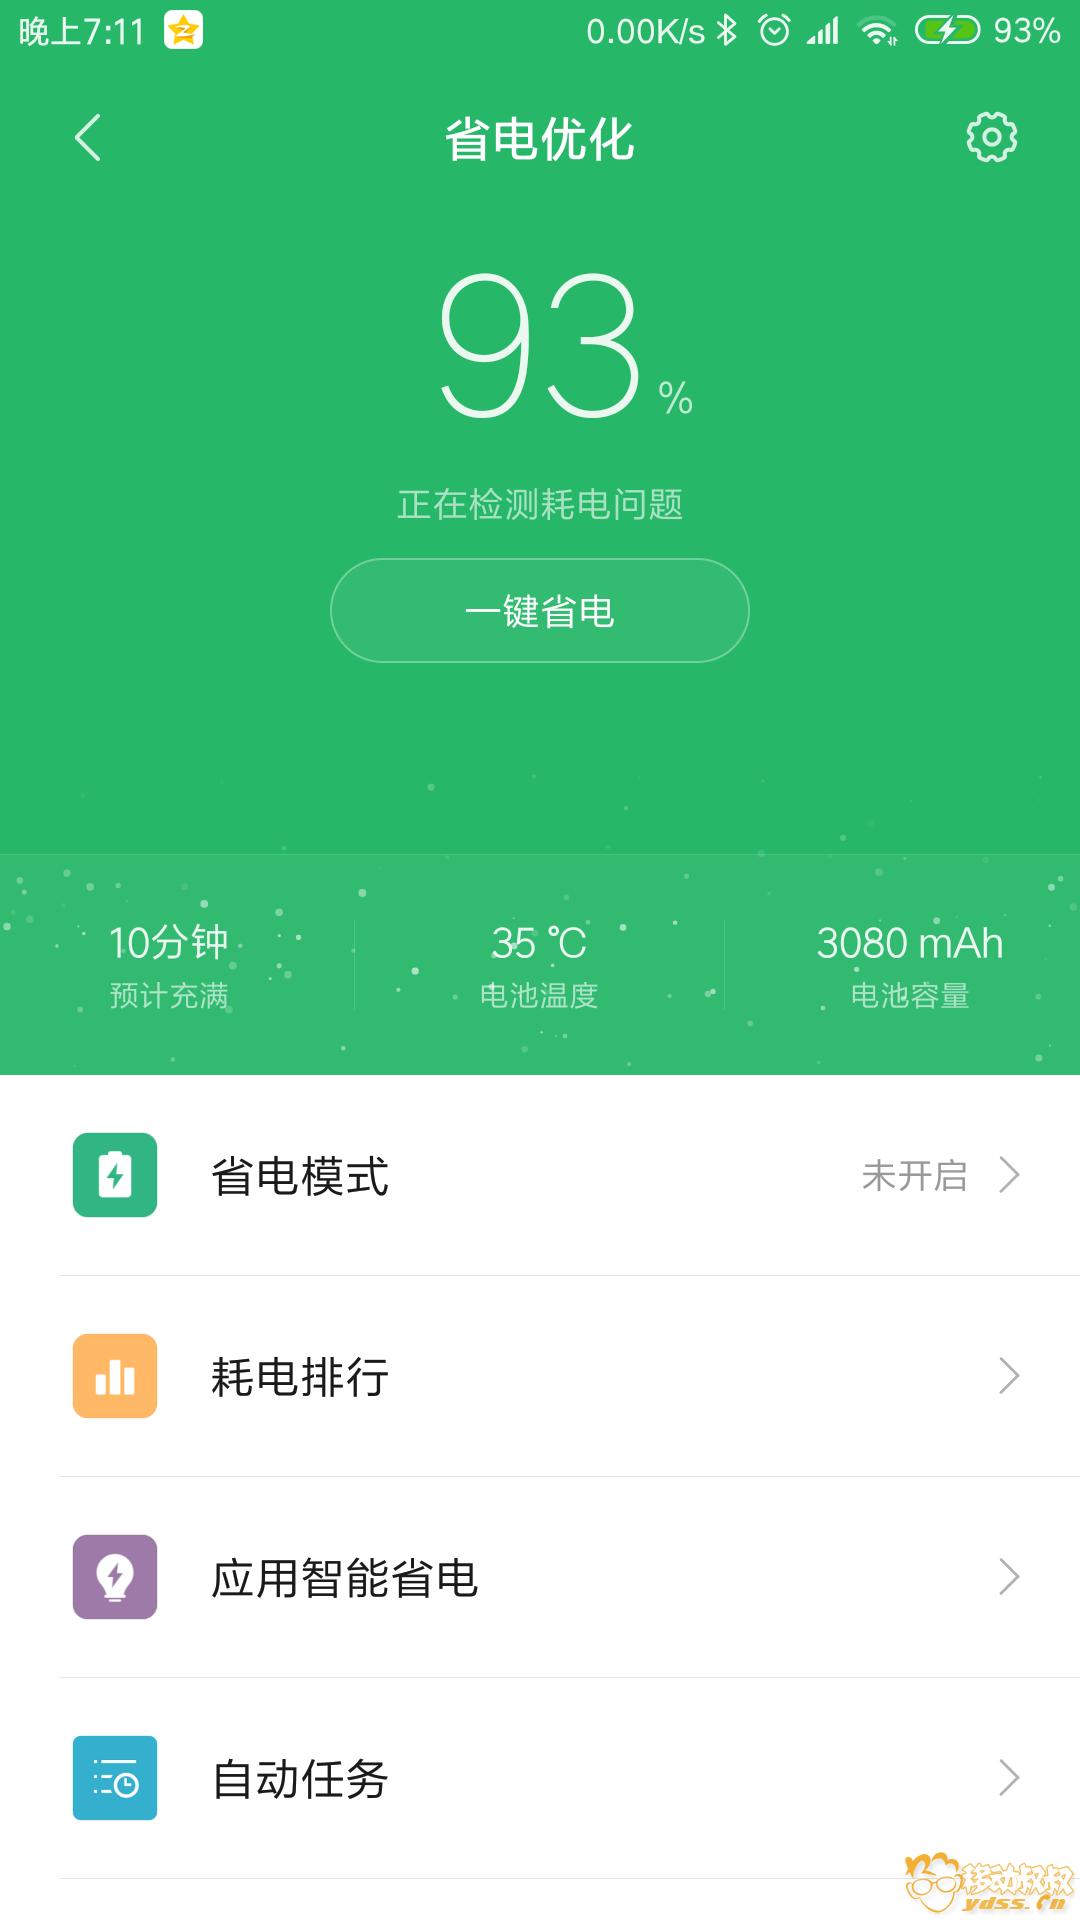 Screenshot_2018-07-04-19-11-23-037_com.miui.secur.png